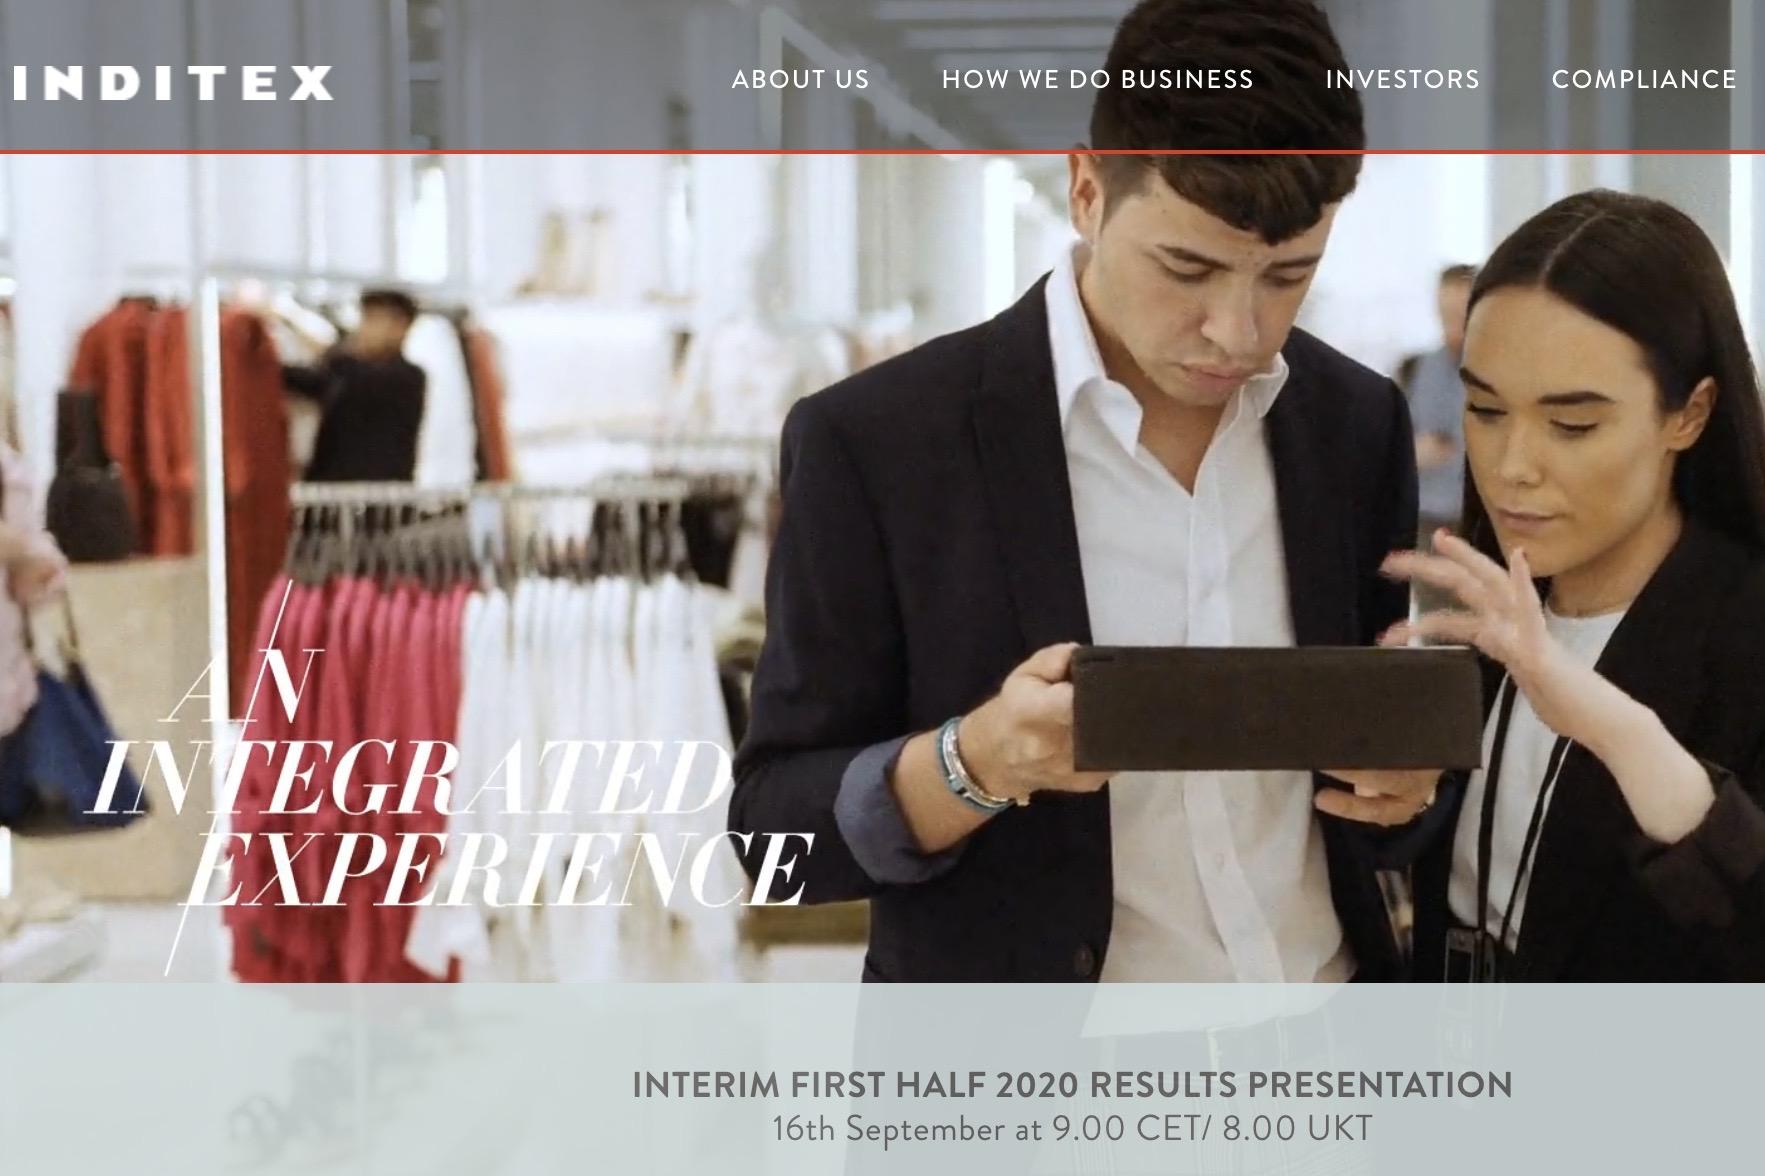 Zara 母公司Inditex上季度扭亏为盈,净利润2.14亿欧元远超分析师预期